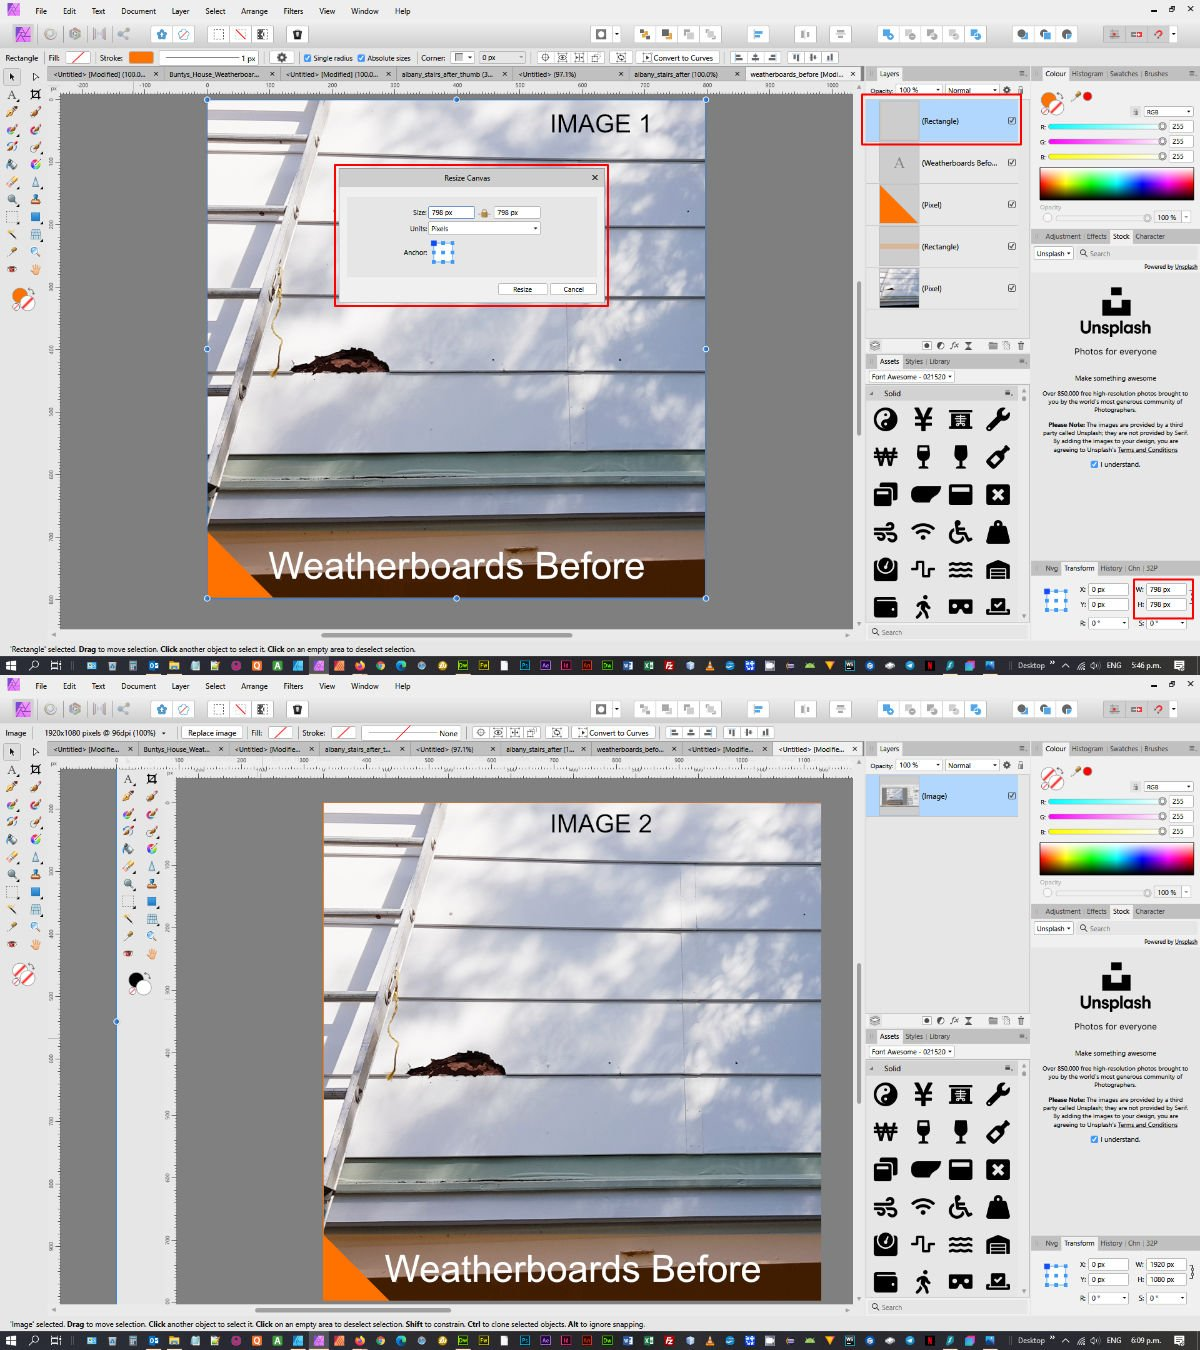 shape_size_Vs_canvas_size.jpg.f5b1827ae4024a672e6bc7686081635f.jpg